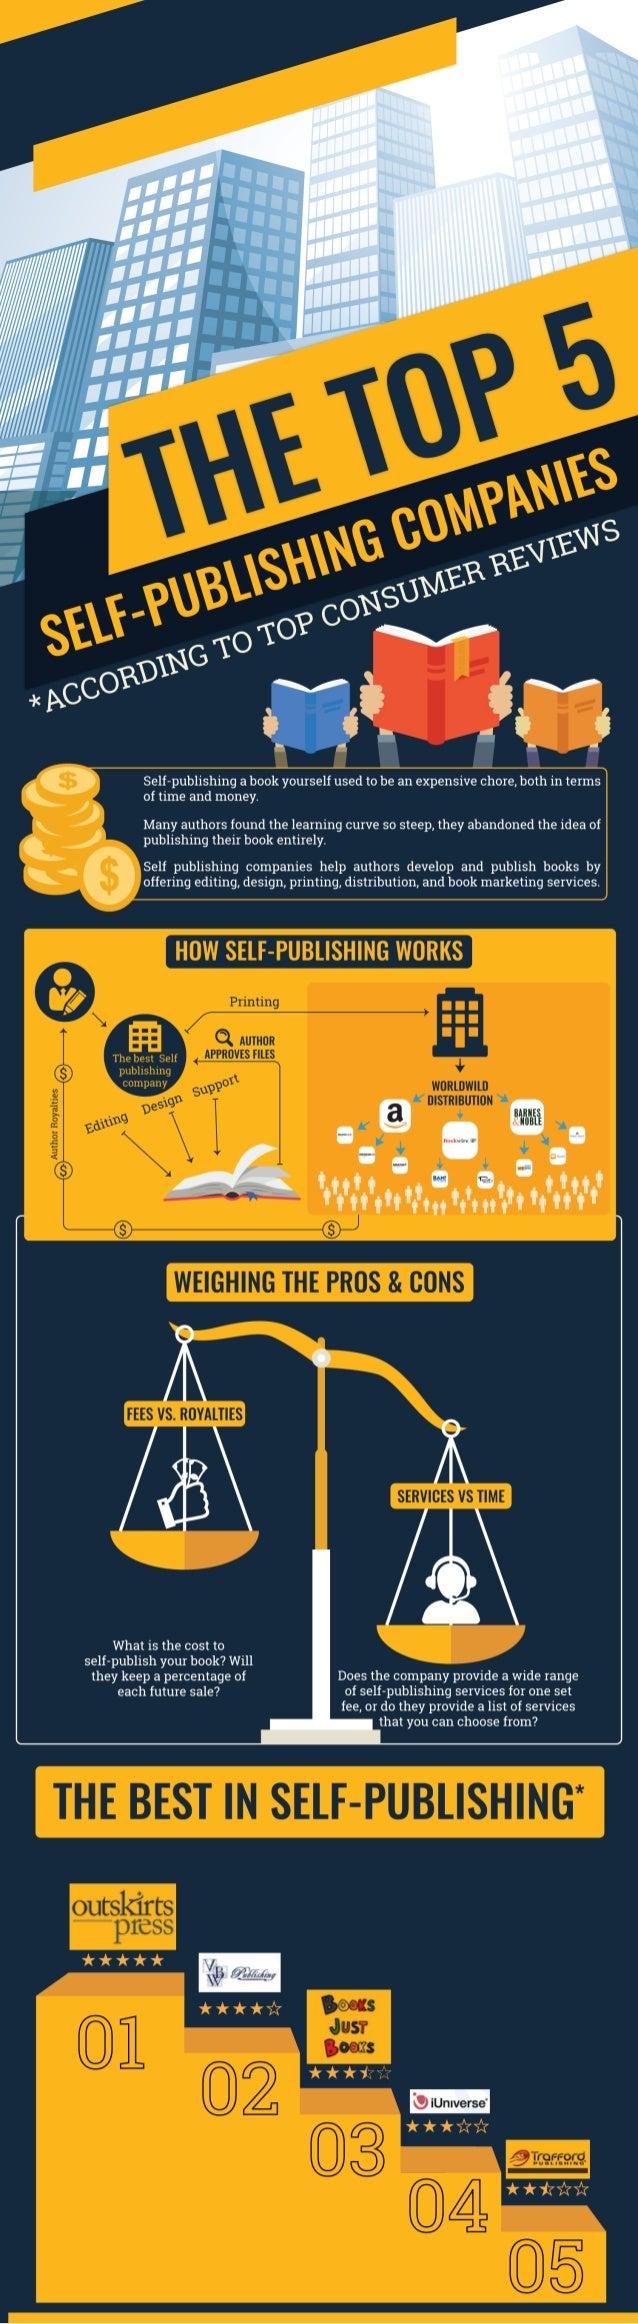 The top 5 self publishing companies